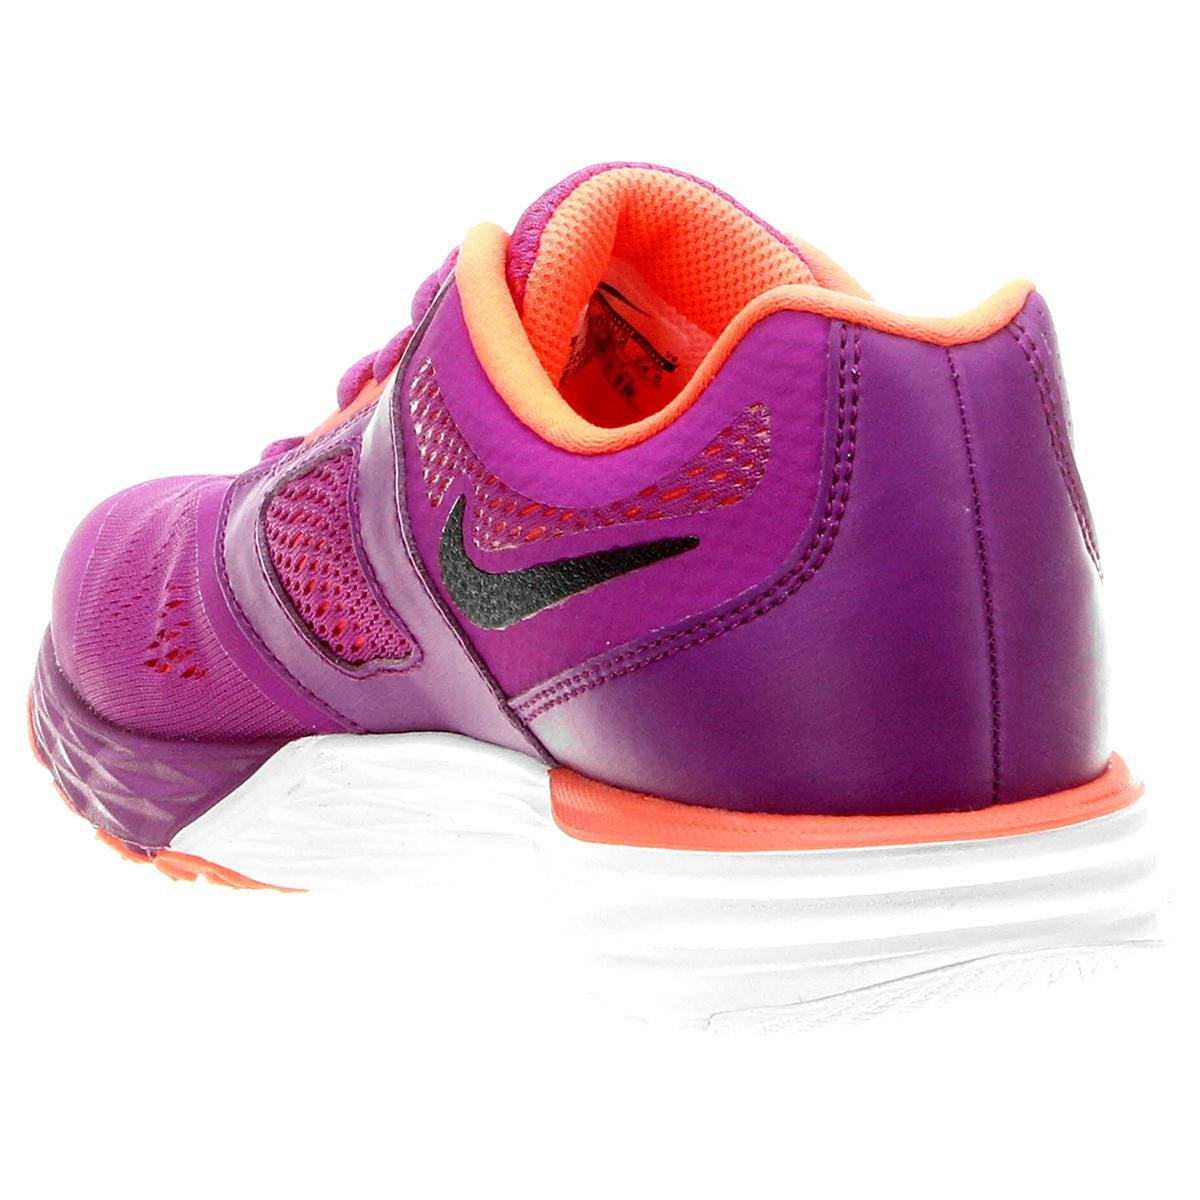 3c3599e0c6 ... Tênis Nike Tri Fusion Run MSL Feminino - Compre Agora Netshoes  210edef137a7ce ...